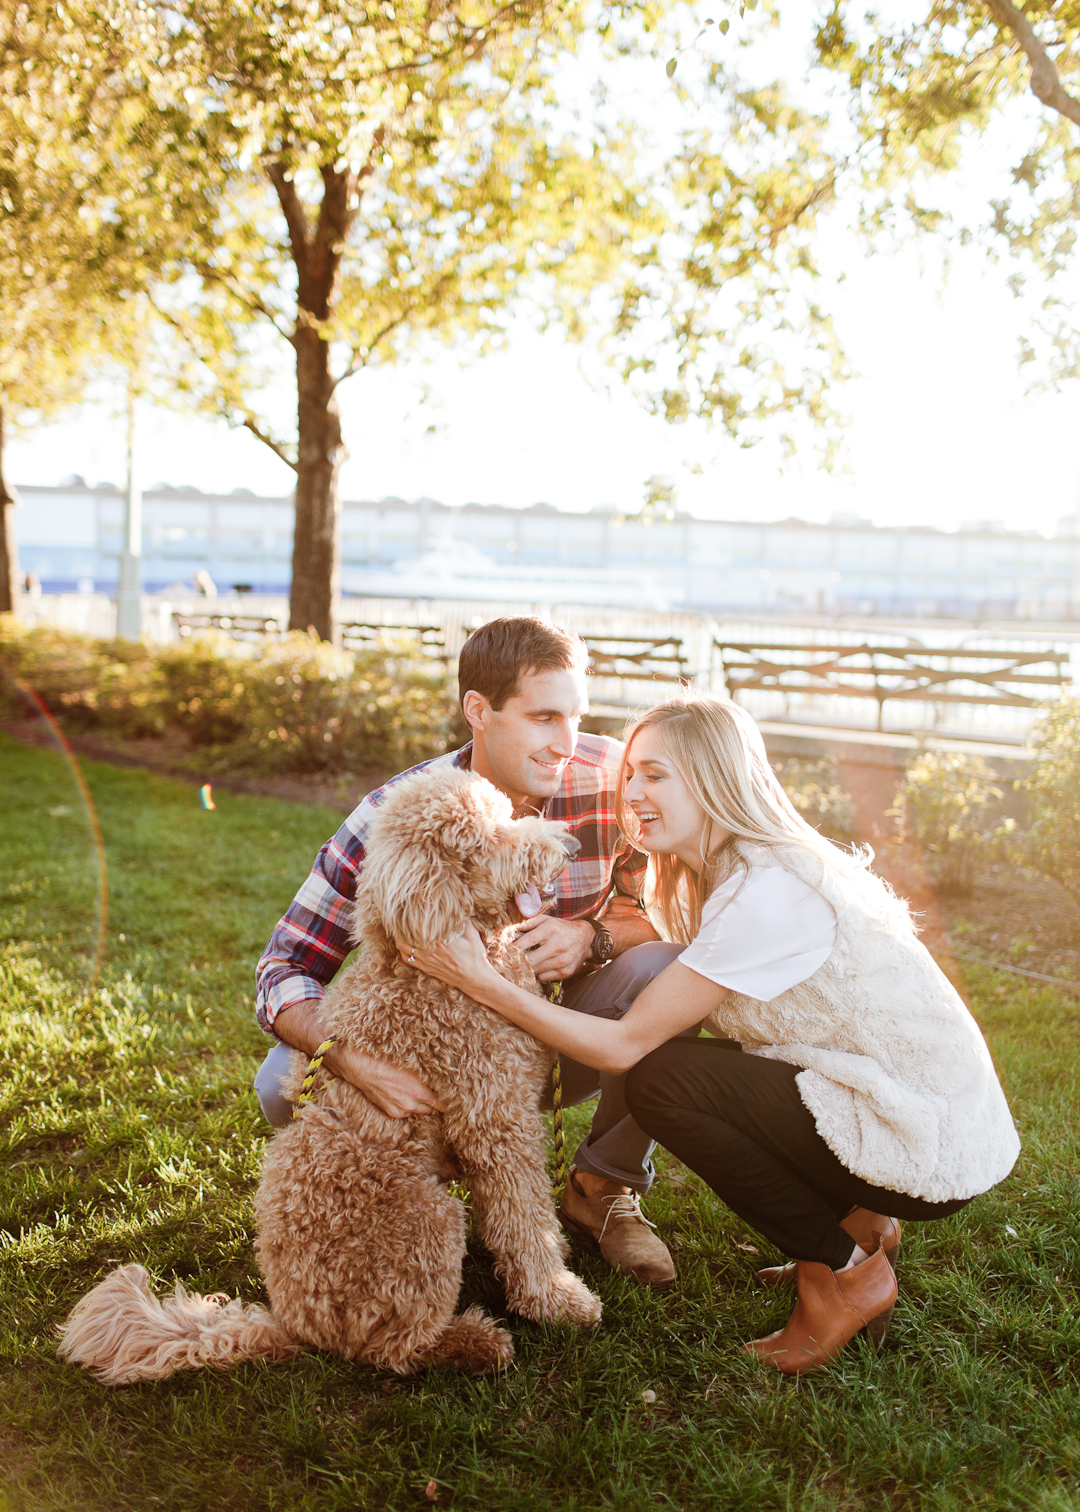 Melissa Kruse Photography - Daniece & Chris West Village Engagement Photos-148.jpg